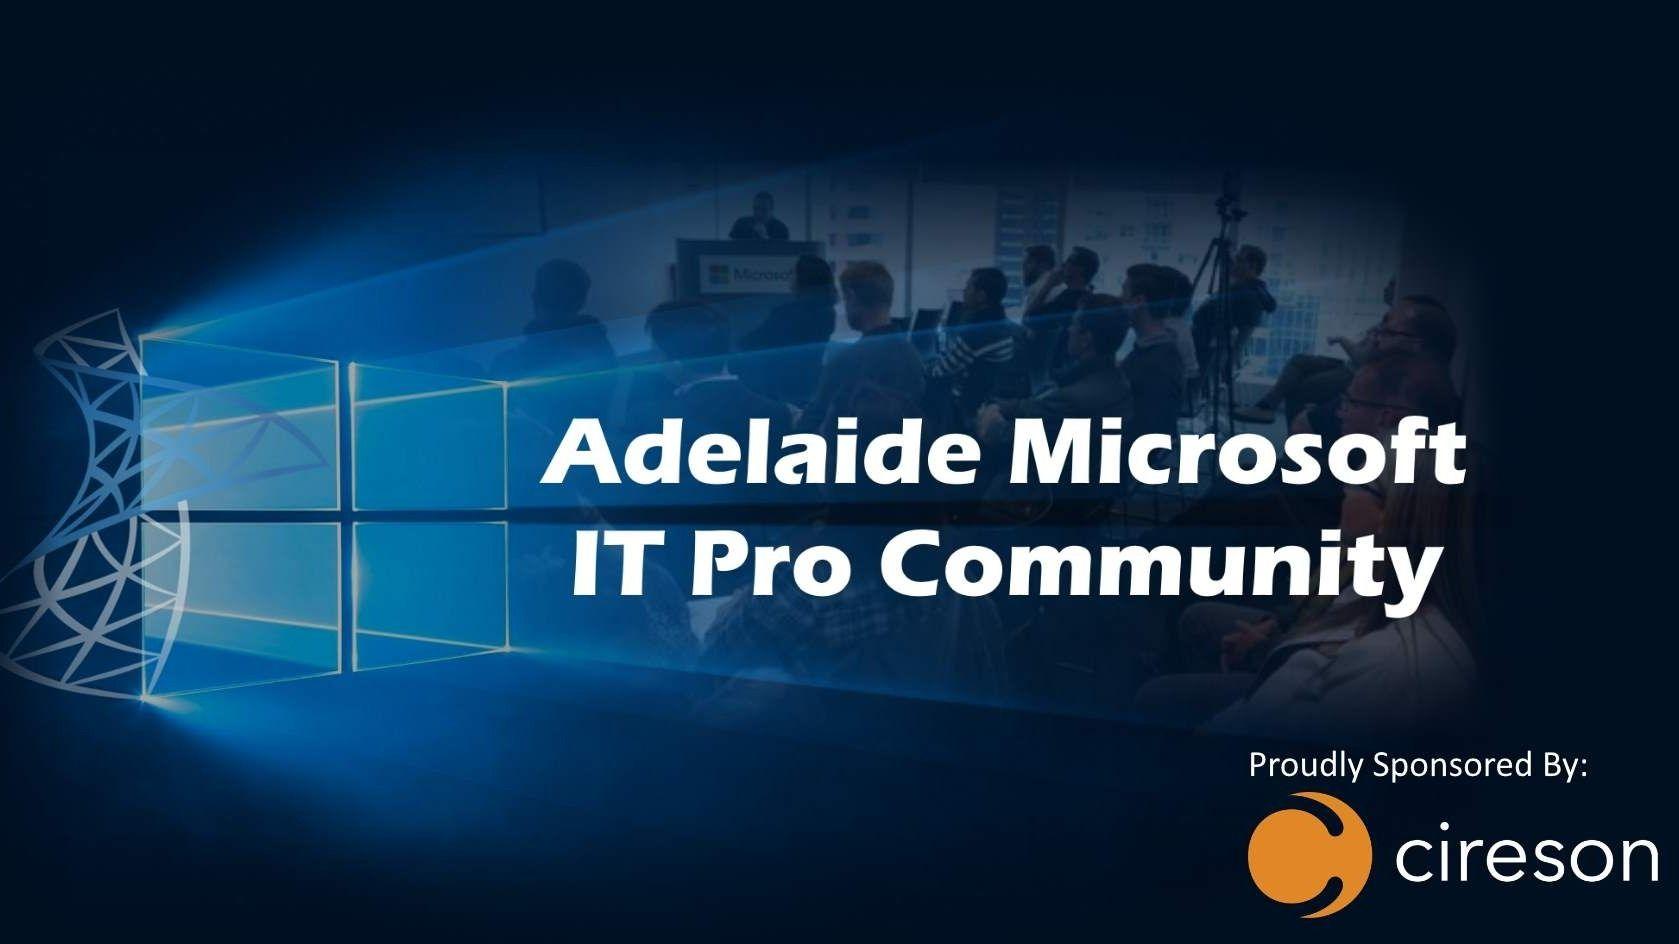 Adelaide Microsoft IT Pro Community